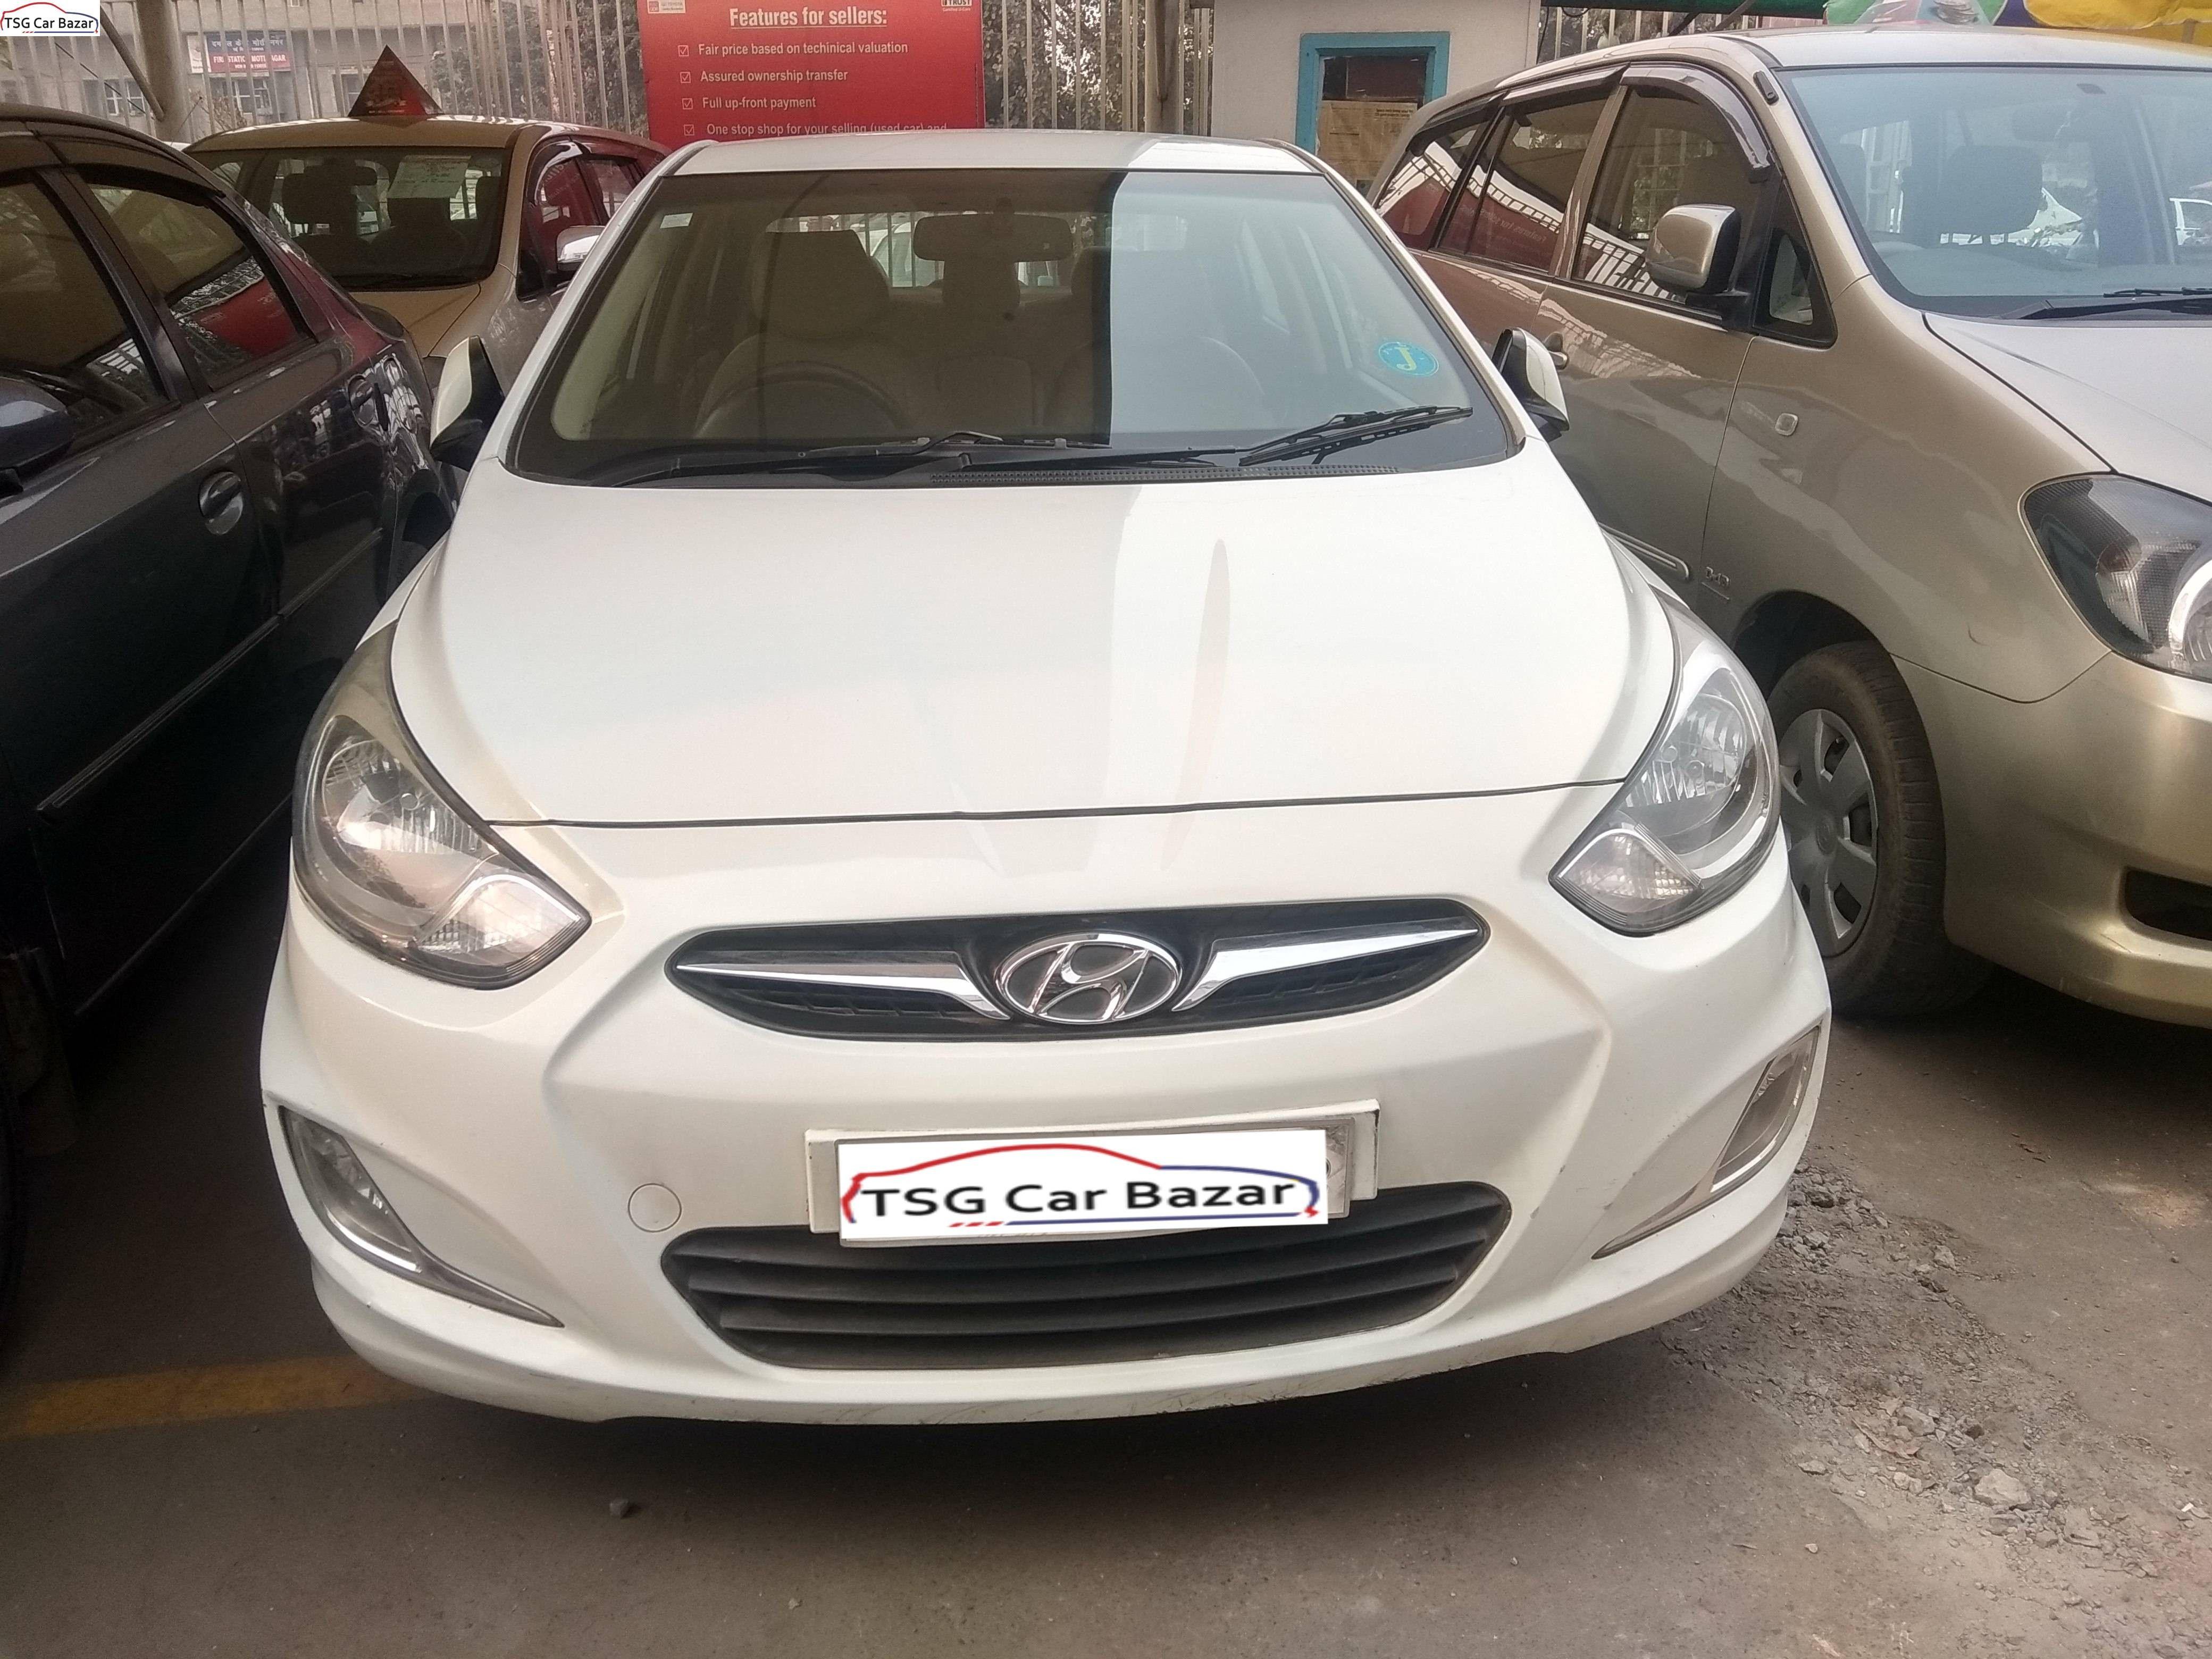 Certified Hyundai Verna Used hyundai, Hyundai models